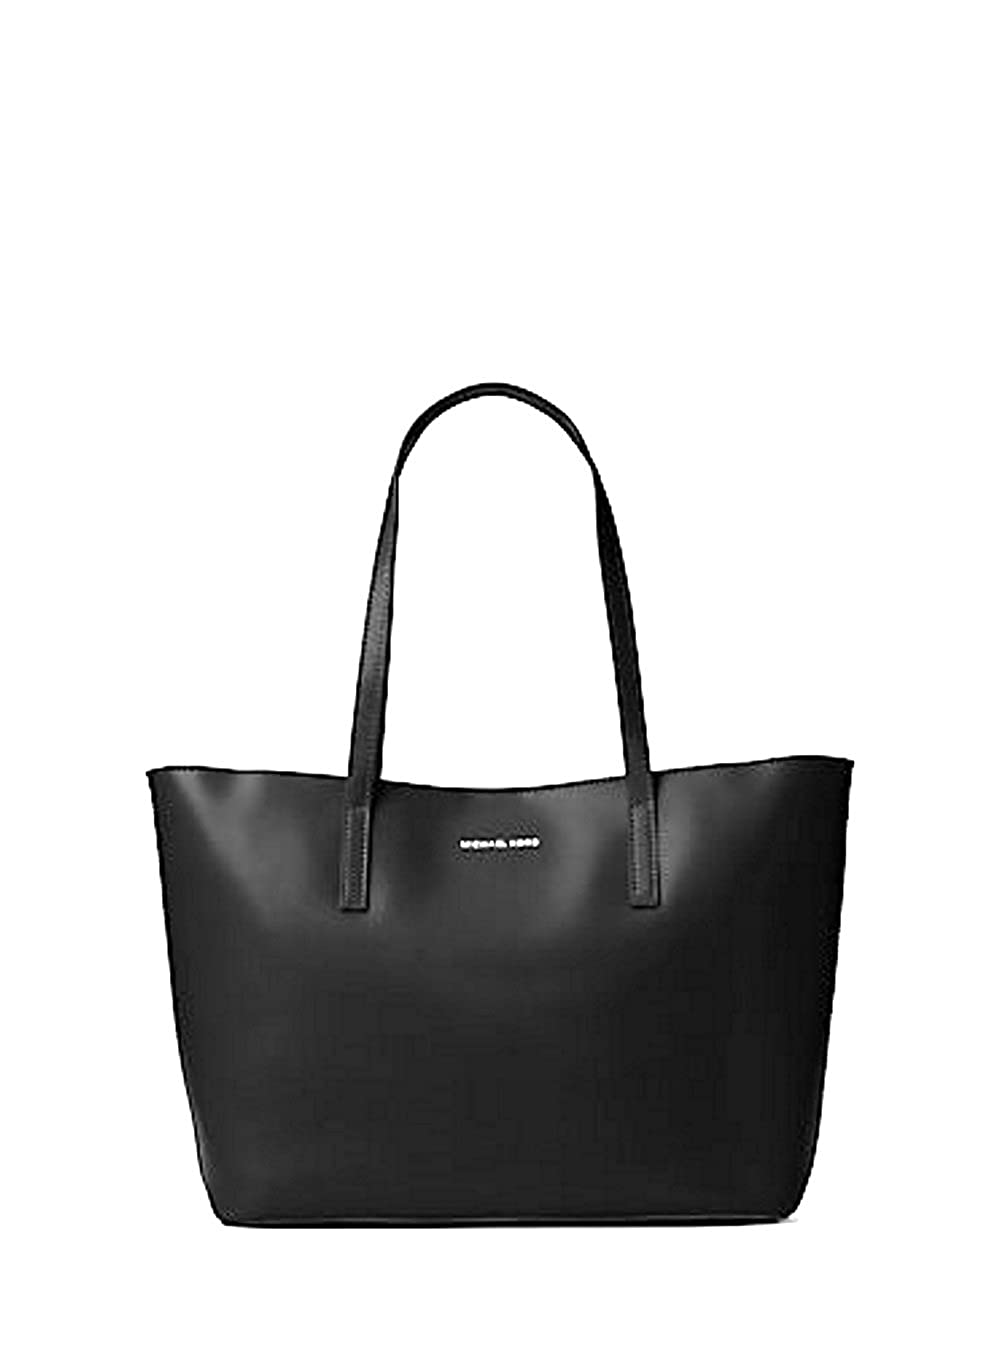 719280c44d7b Amazon.com: MICHAEL Michael Kors Emry Medium Leather Tote Bag: Clothing